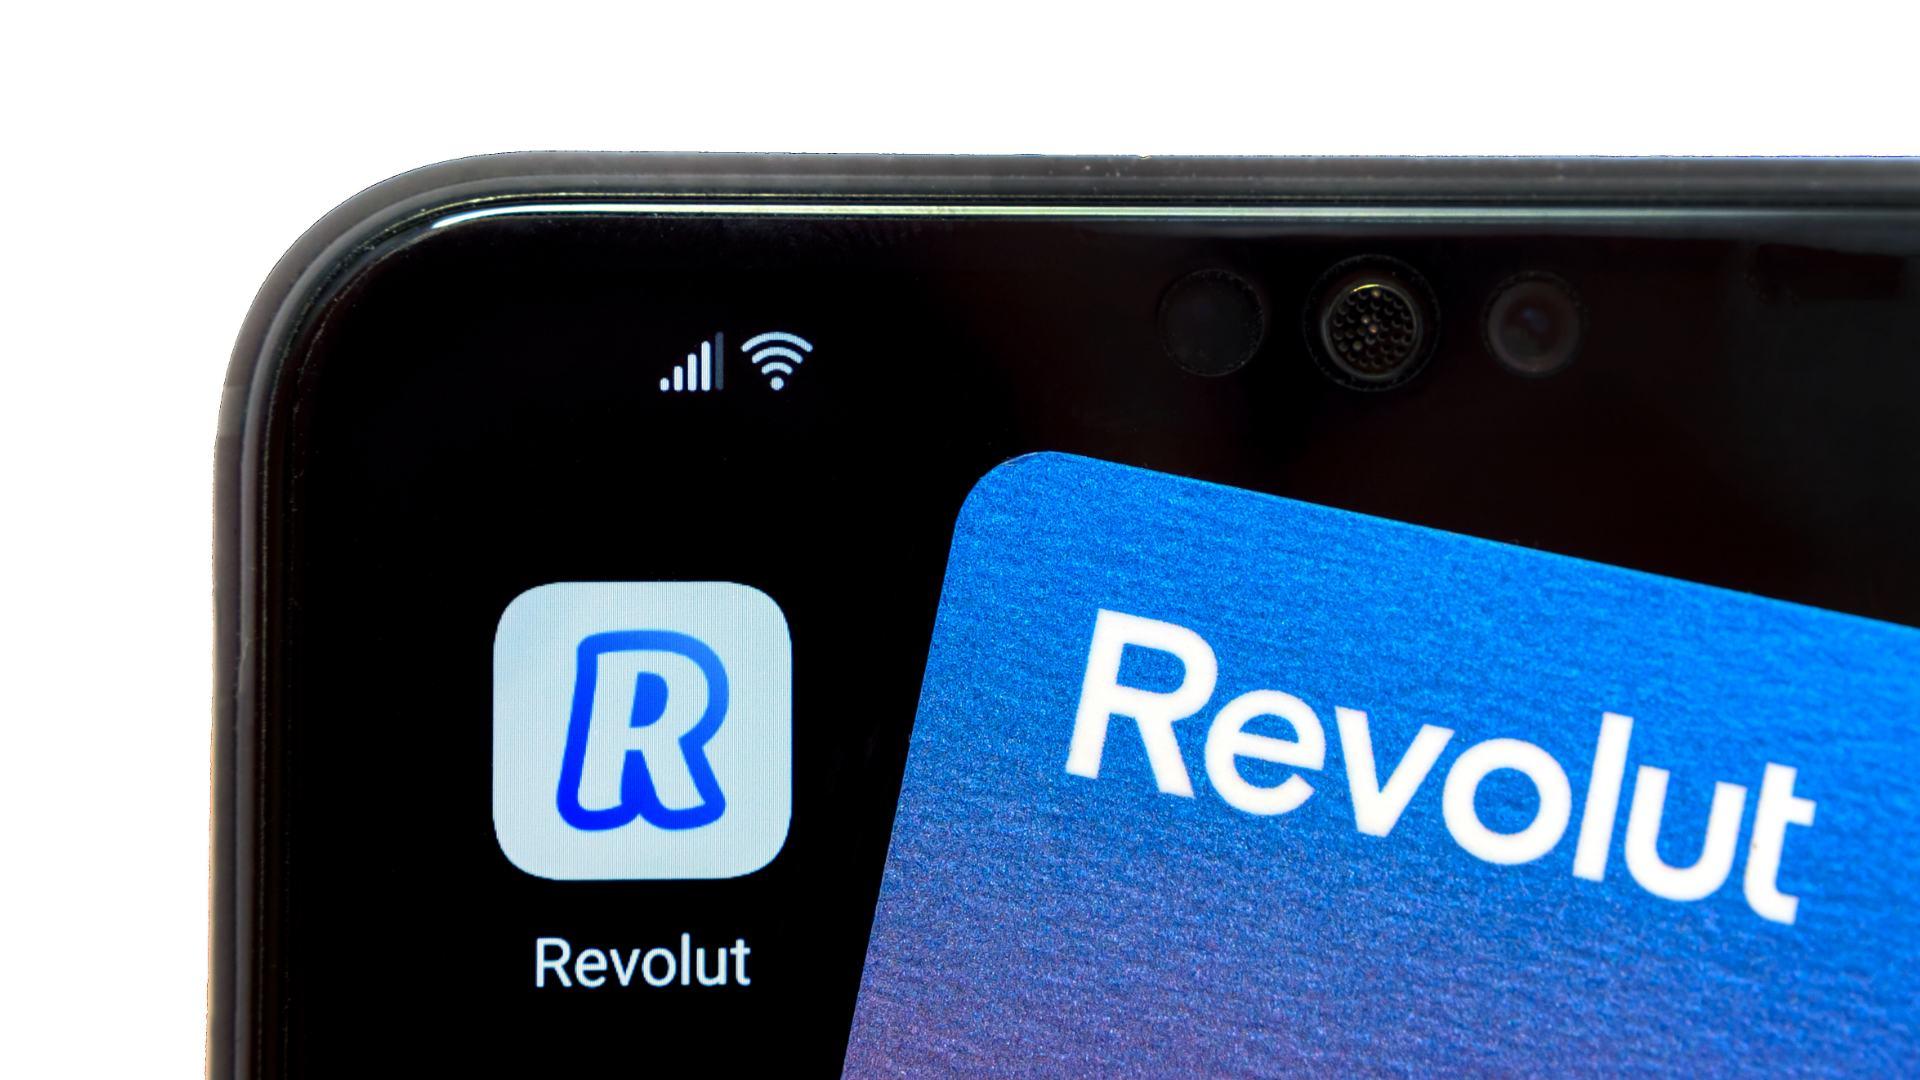 revolut-payday-fintech-superapp